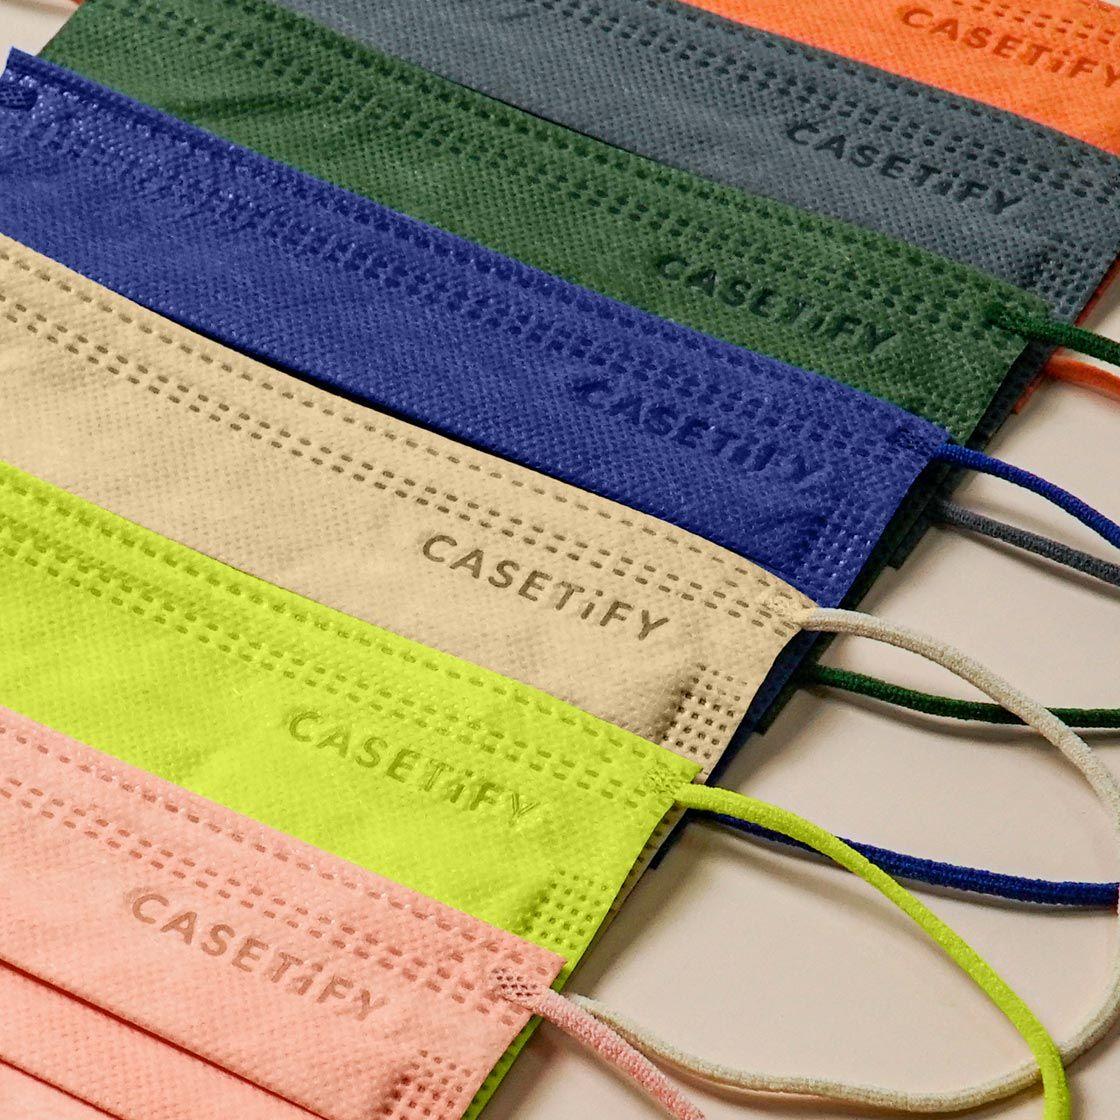 CASETiFY 口罩 ; CASETiFY推出 7 款靚色:米色、三文魚粉、深灰、螢光綠、軍綠、橙色及深藍色,耳繩仲係口罩同色嫁